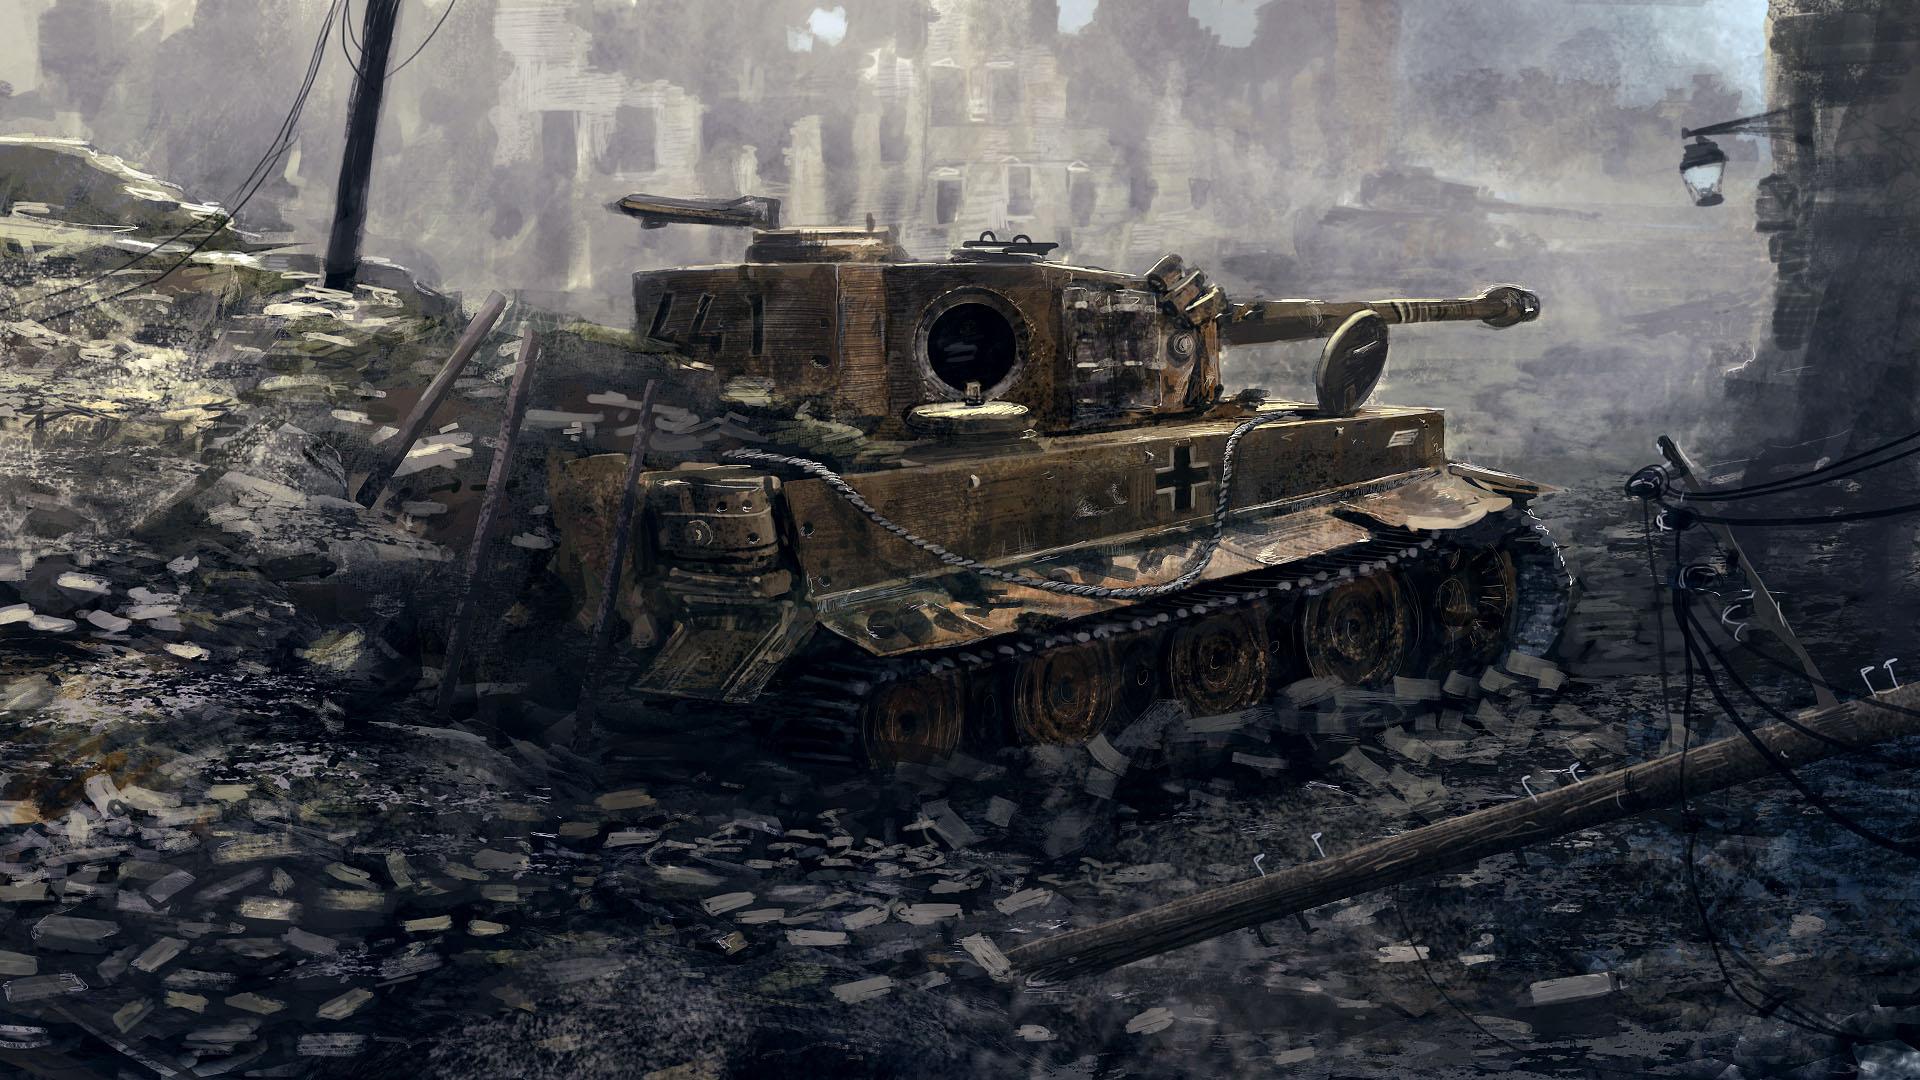 Battlefield 3. Sniper wallpaper - Tanks - Military - Wallpaper ...